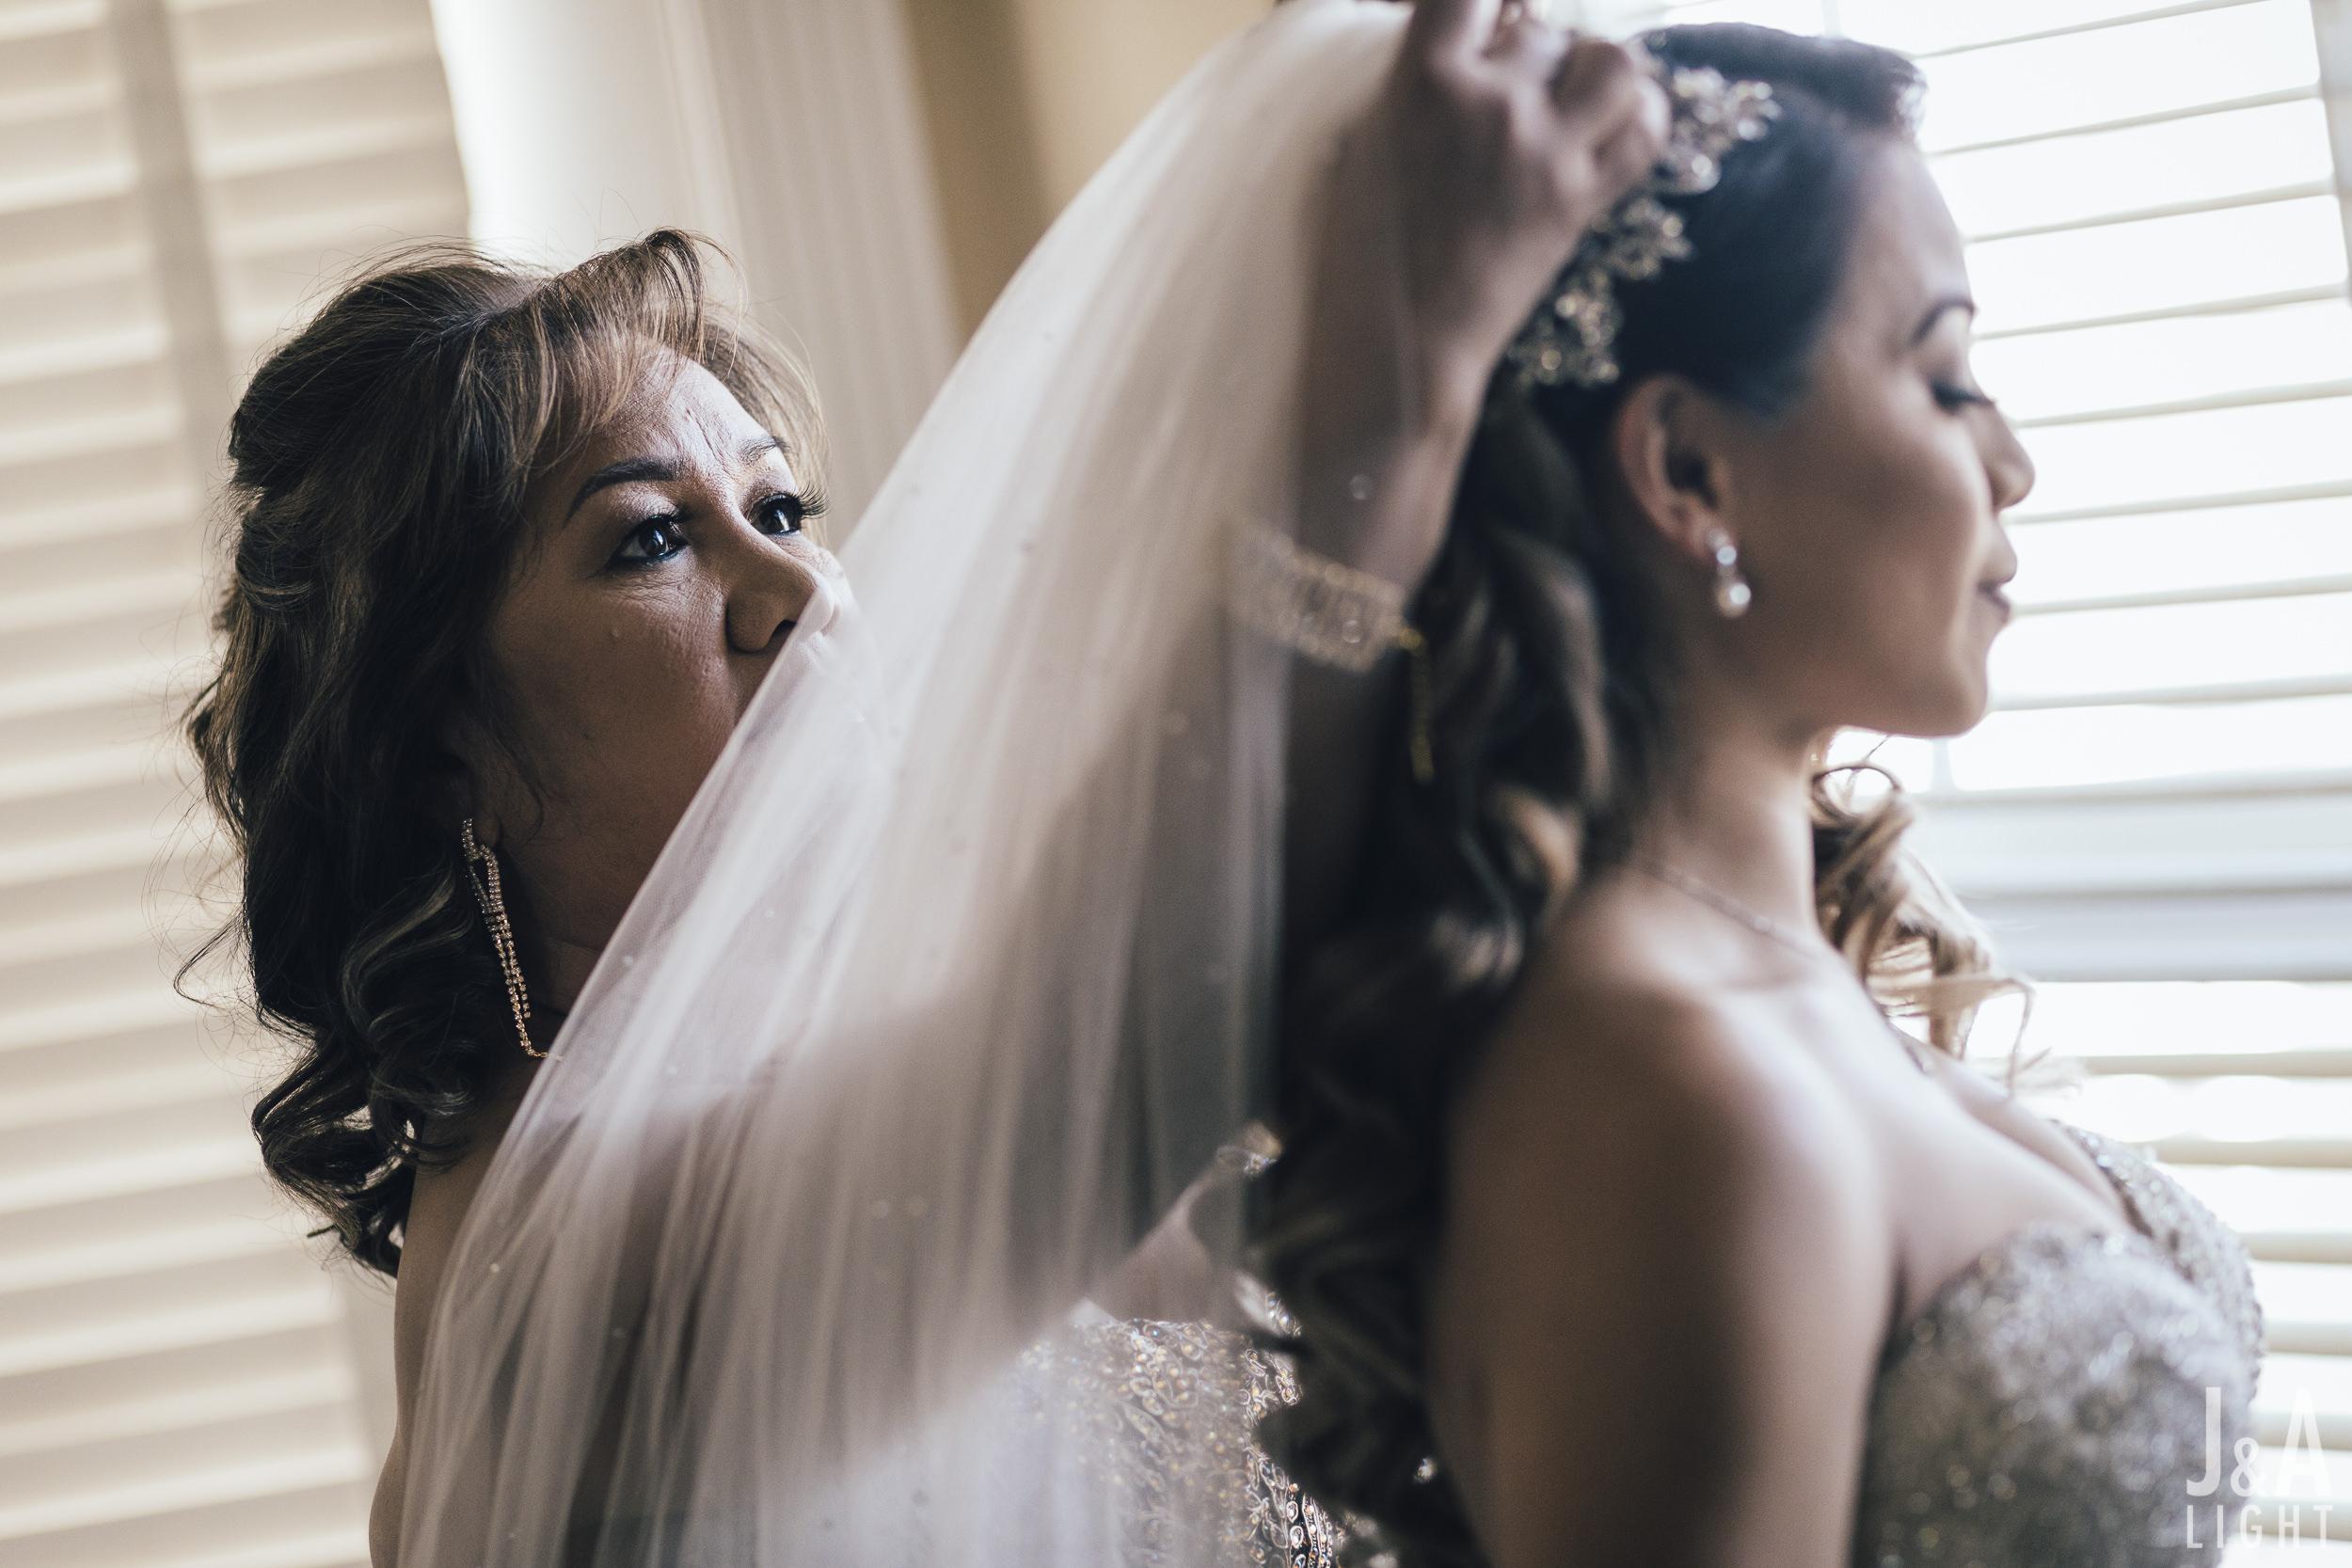 20171014-JanDan-LosBanos-GlassMansion-Wedding-Blog-014.jpg